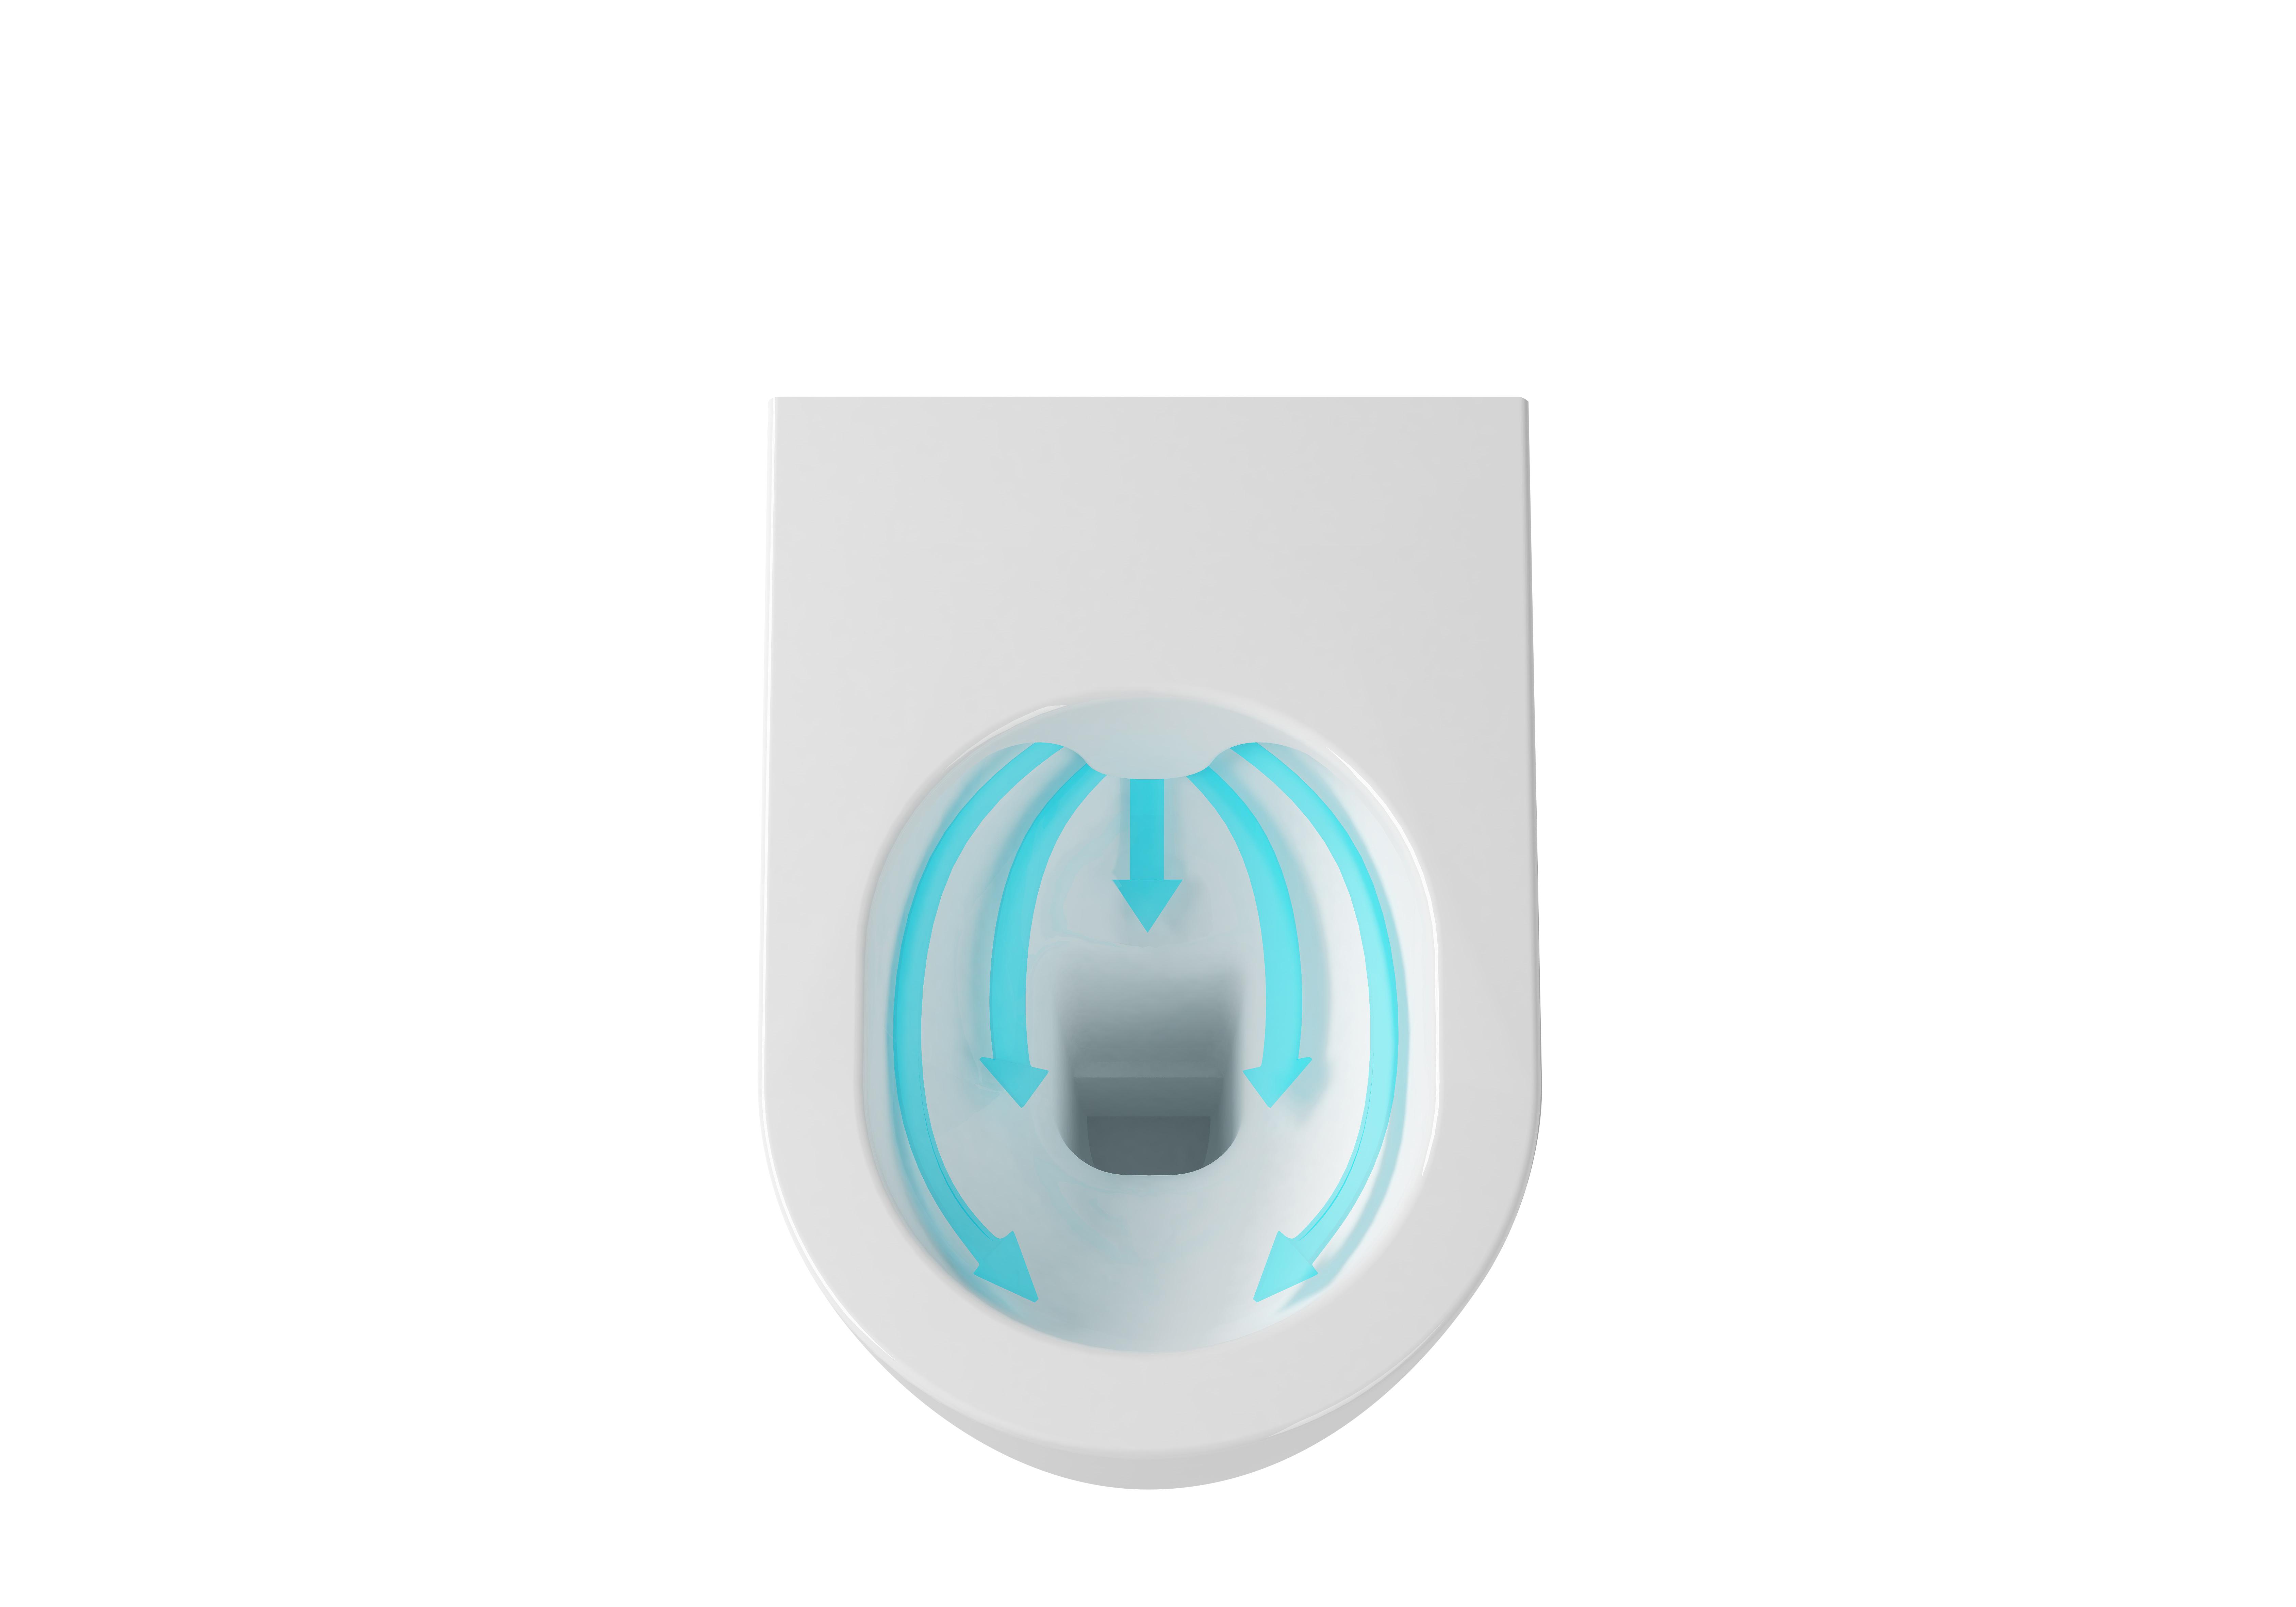 WC Uni Chrome RimOff horni pohled sipky RAVAK 2016